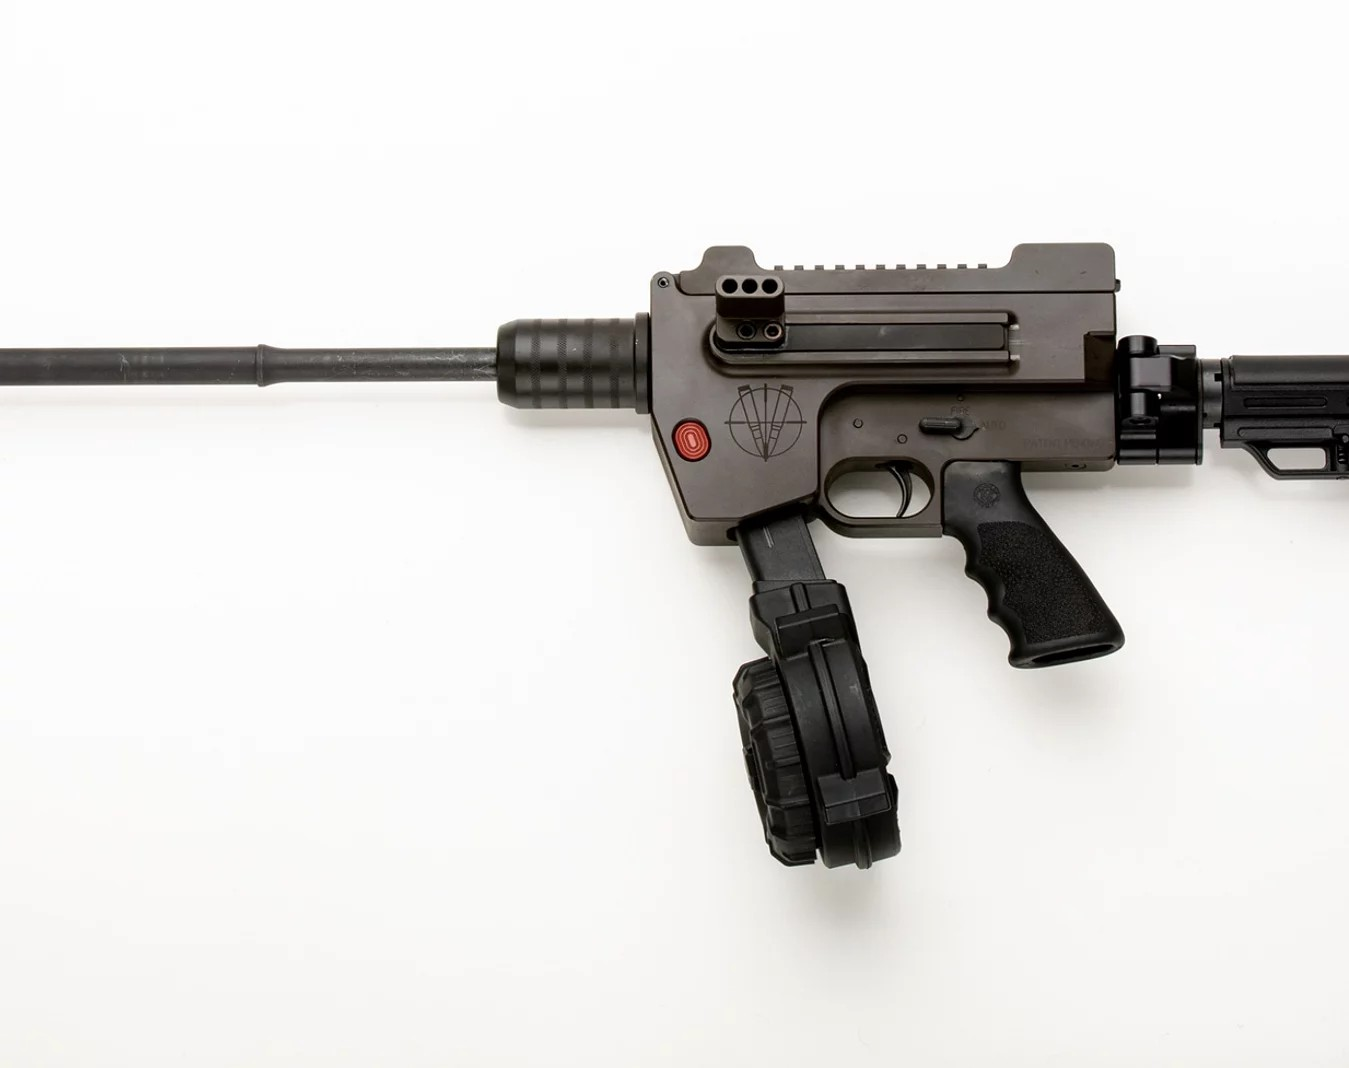 vigilance rifles model 20 9mm submachine gun pistol caliber carbine ar-15 trigger